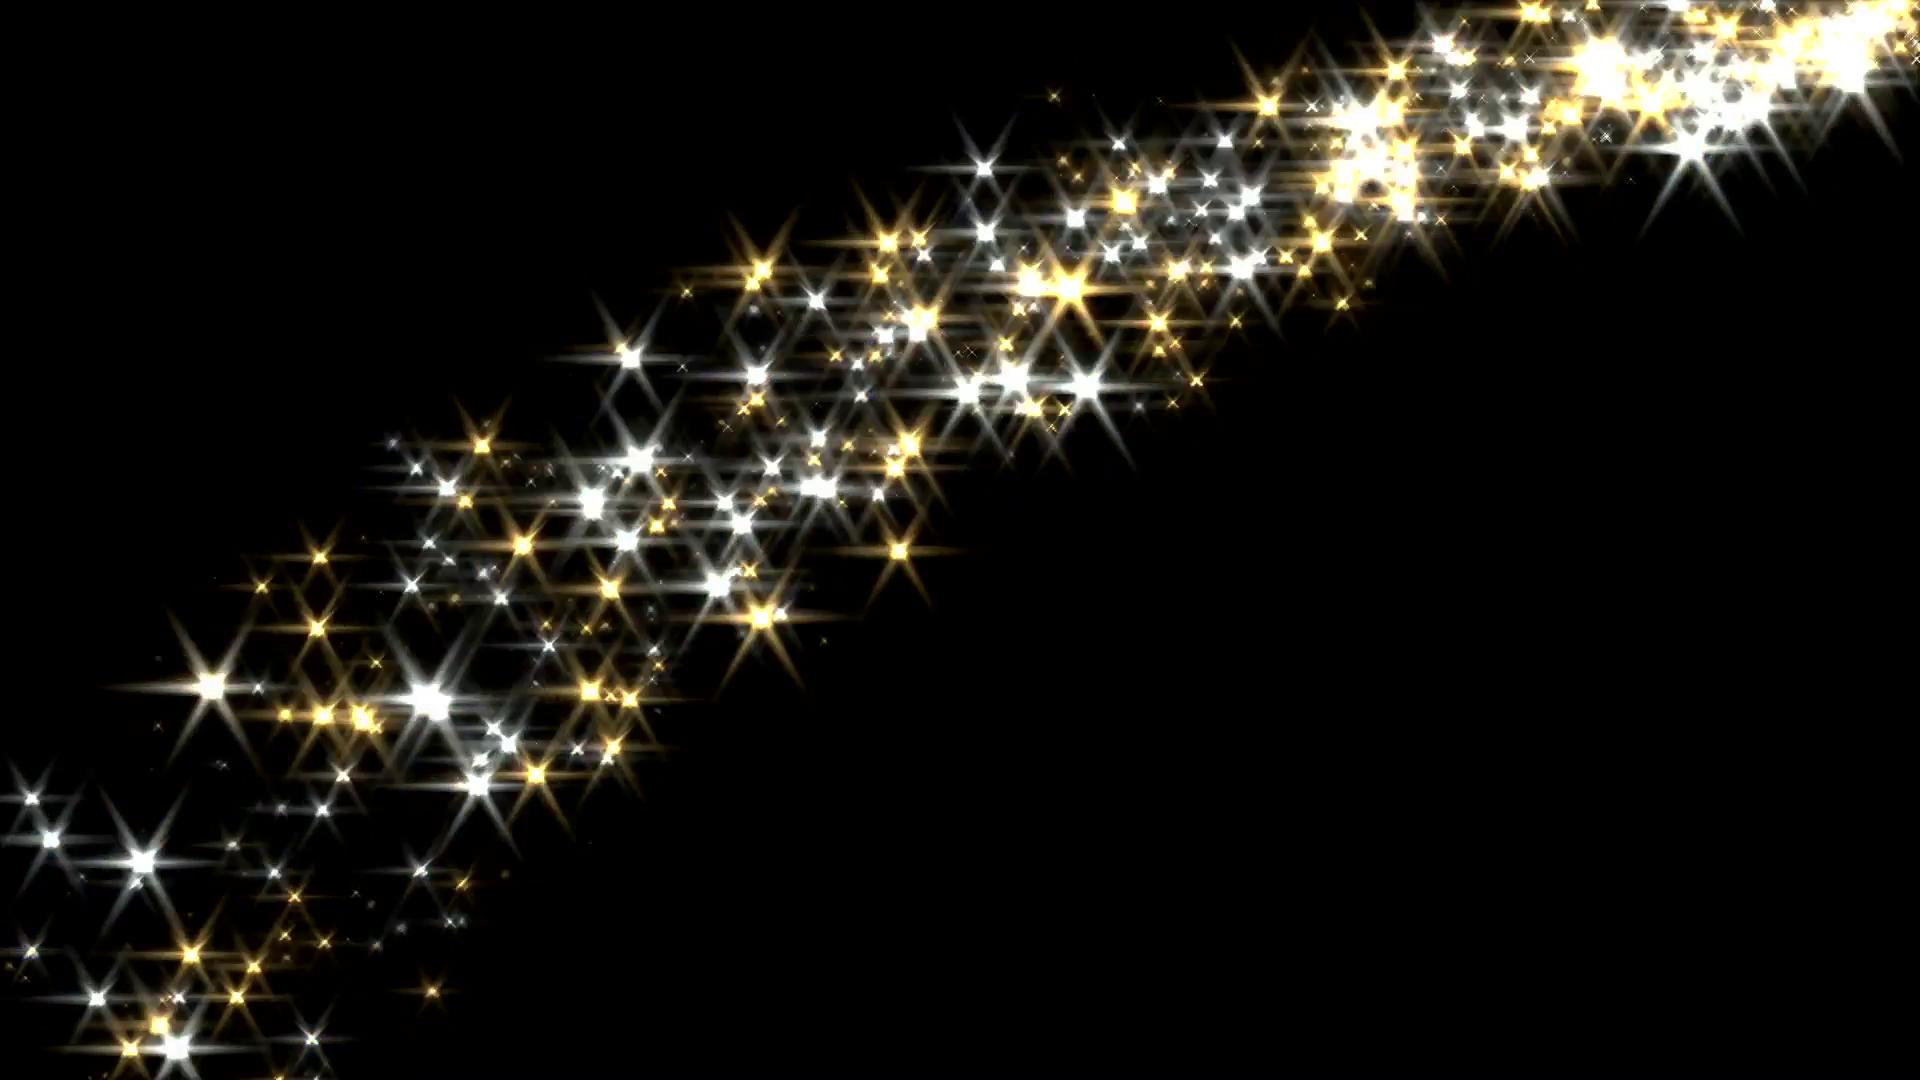 Sparkle Png Hd Magic Sparkles Fairy Dust Wand Particle Trail Gold Silver Transition L R Motion Background Vide Sparkle Png Disney Background Motion Backgrounds